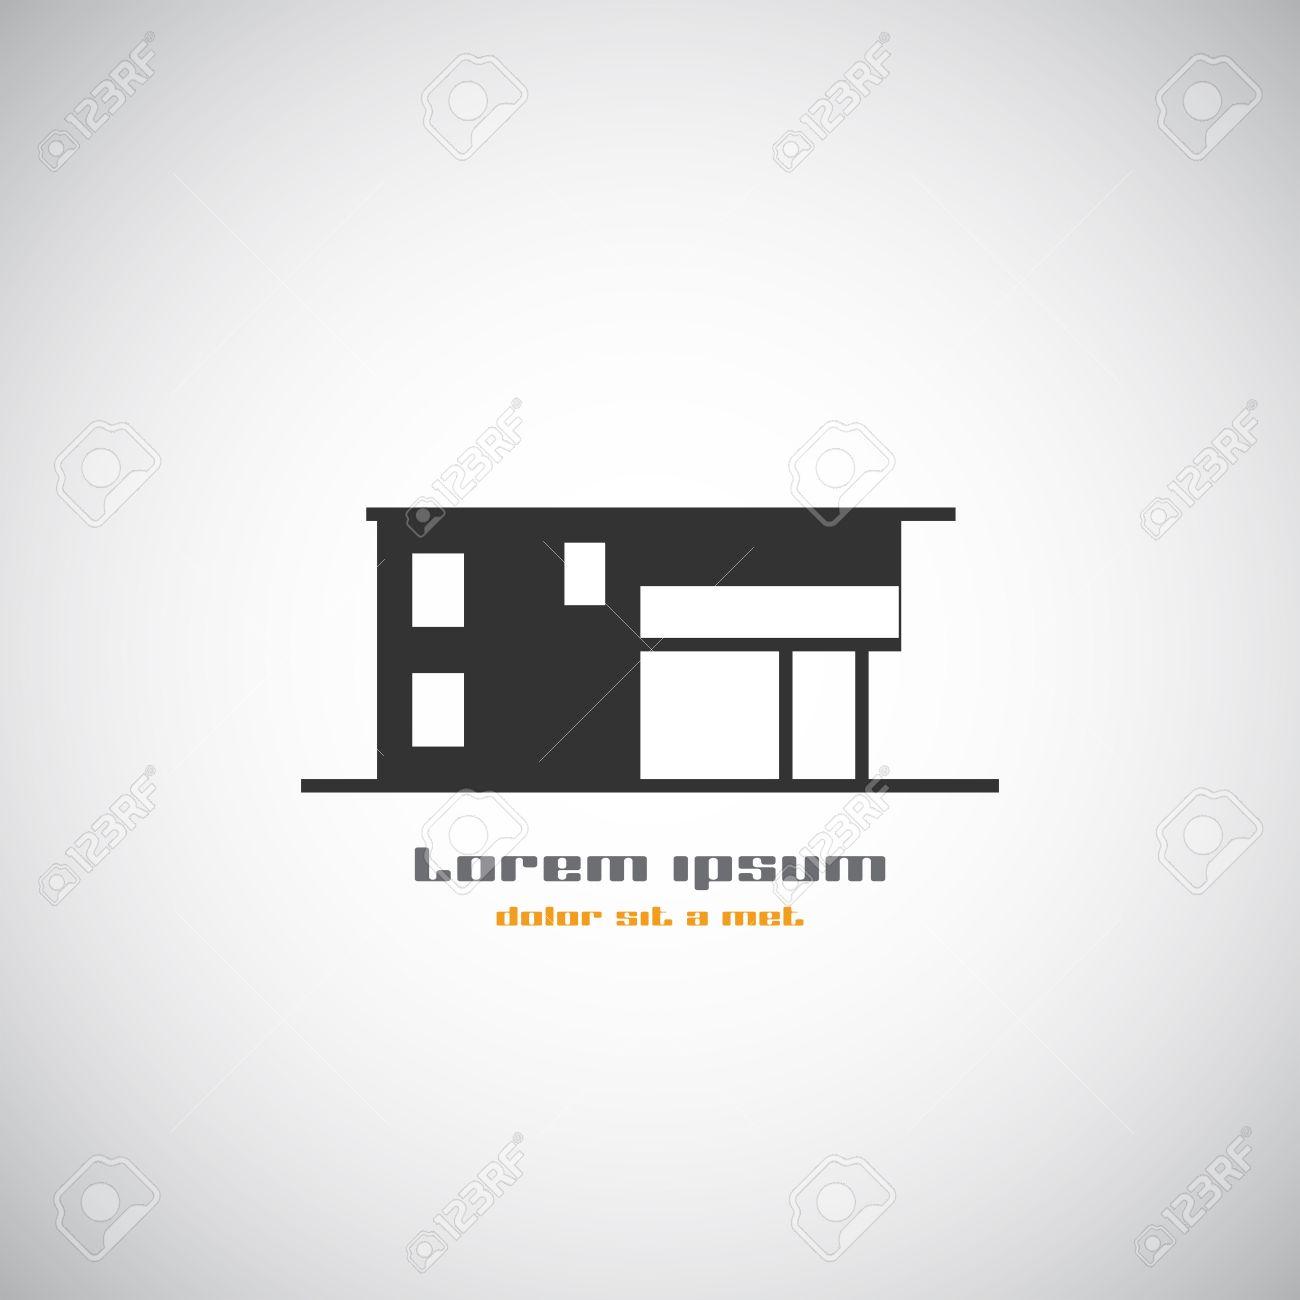 real estate house logo design template icon modern graphic concept element - Home Graphic Design